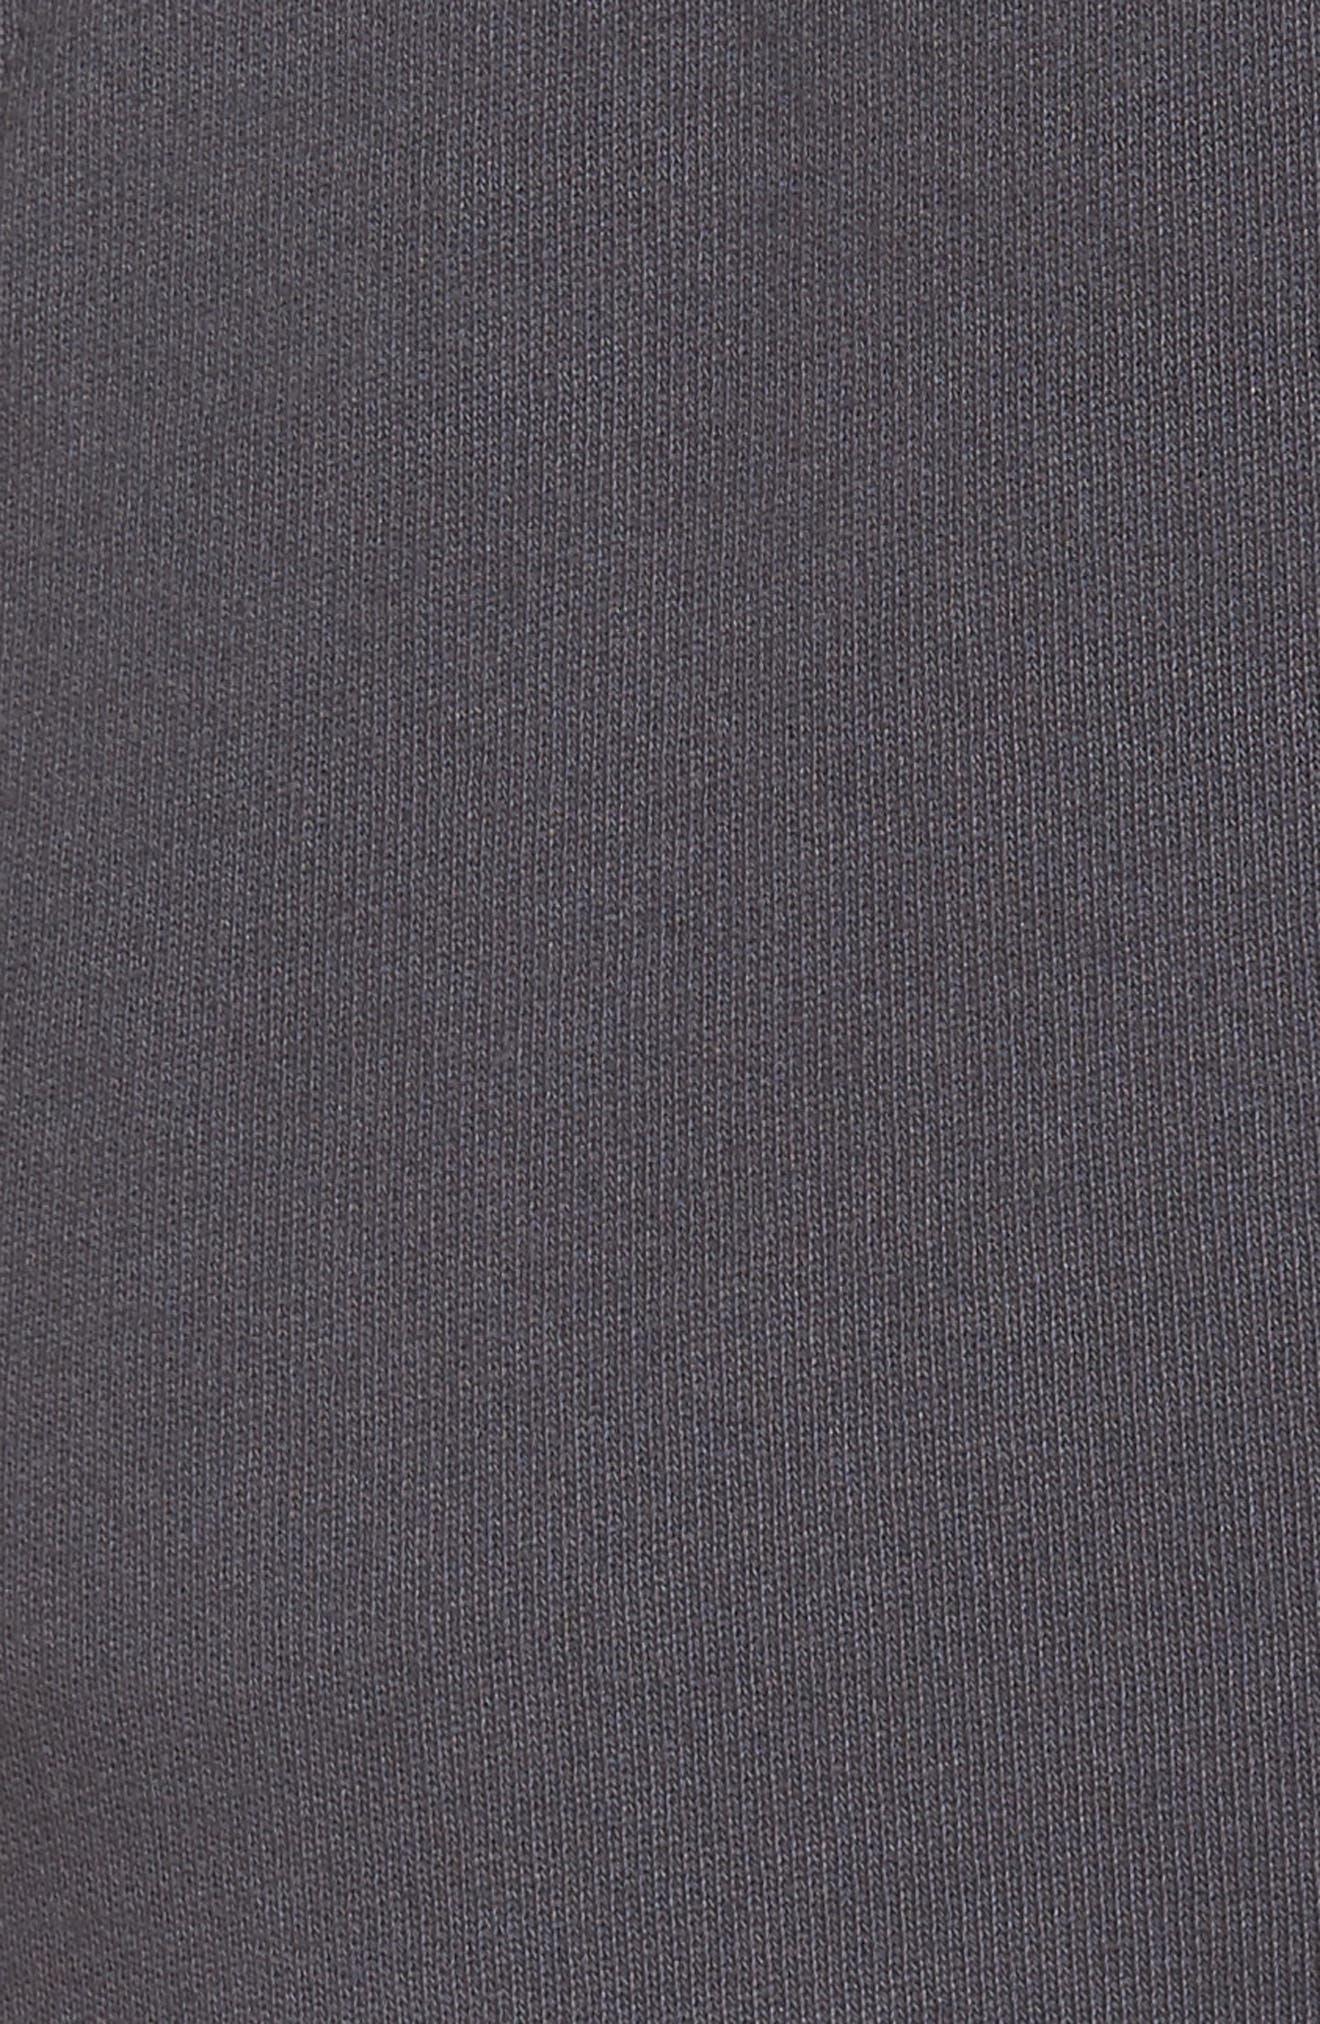 Raw Hem Crop Sweatpants,                             Alternate thumbnail 5, color,                             010